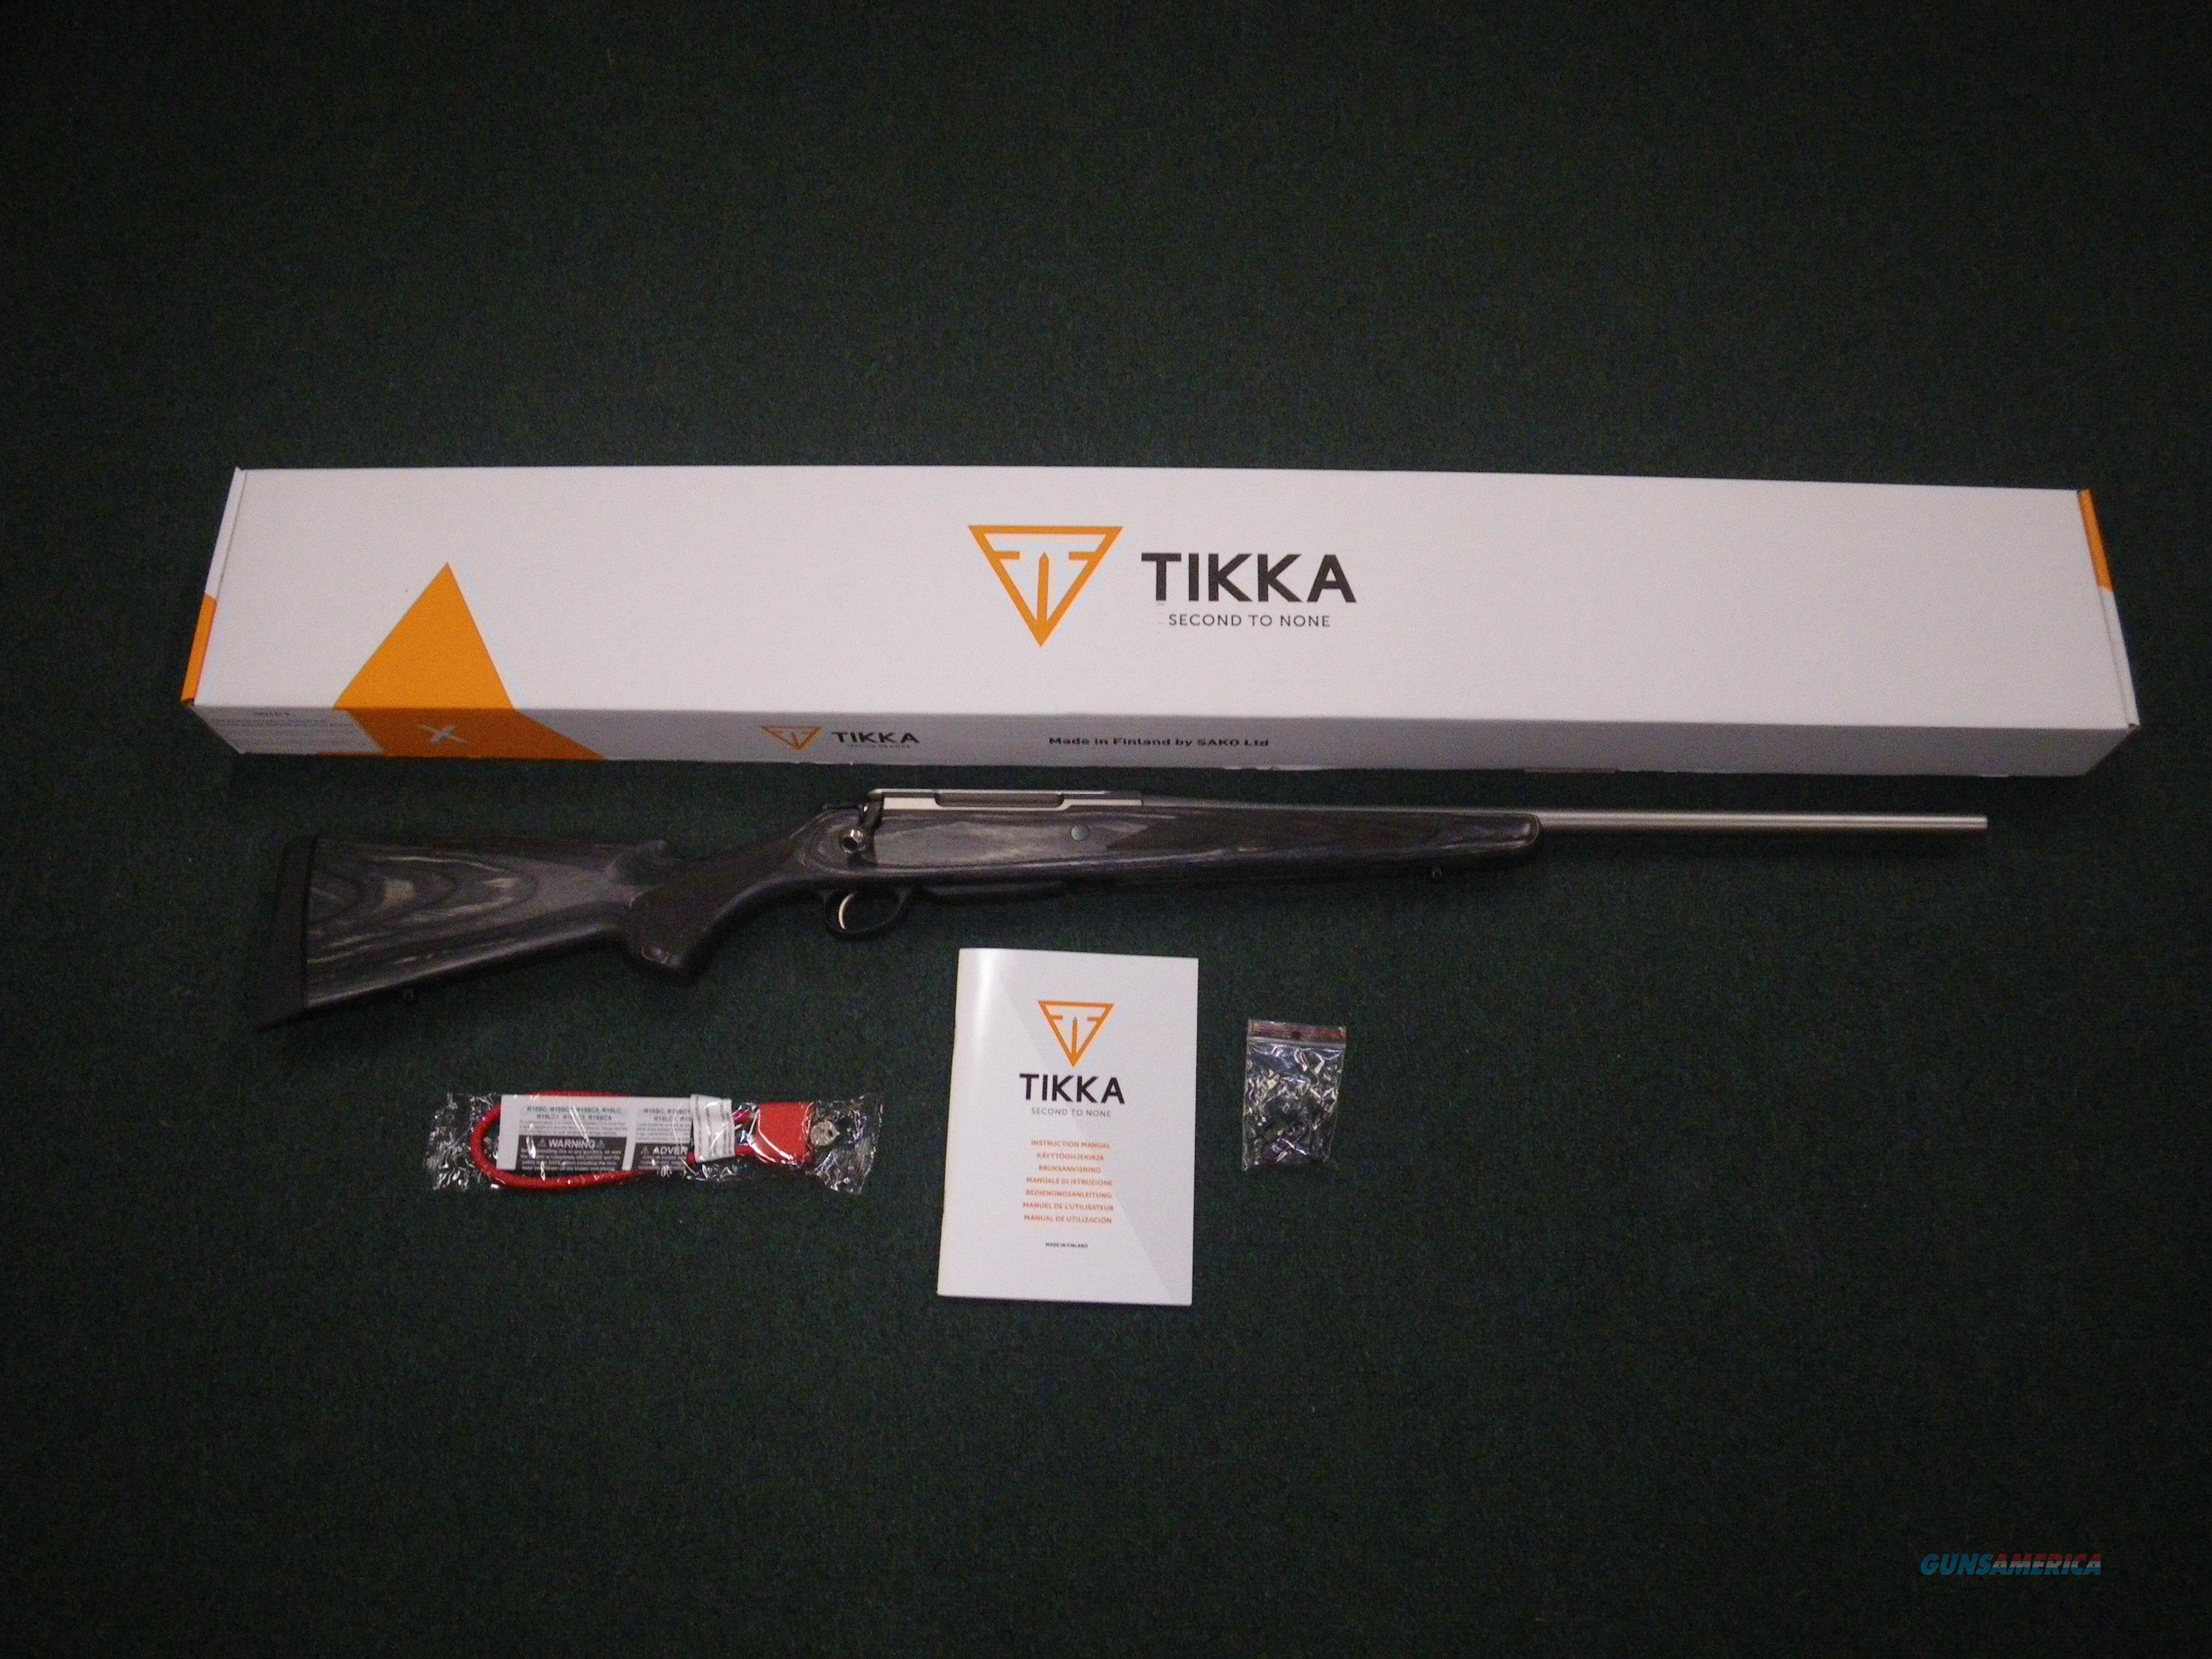 "Tikka T3x Laminated Stainless 7mm Rem Mag 24.3"" NEW #JRTXG370  Guns > Rifles > Tikka Rifles > T3"